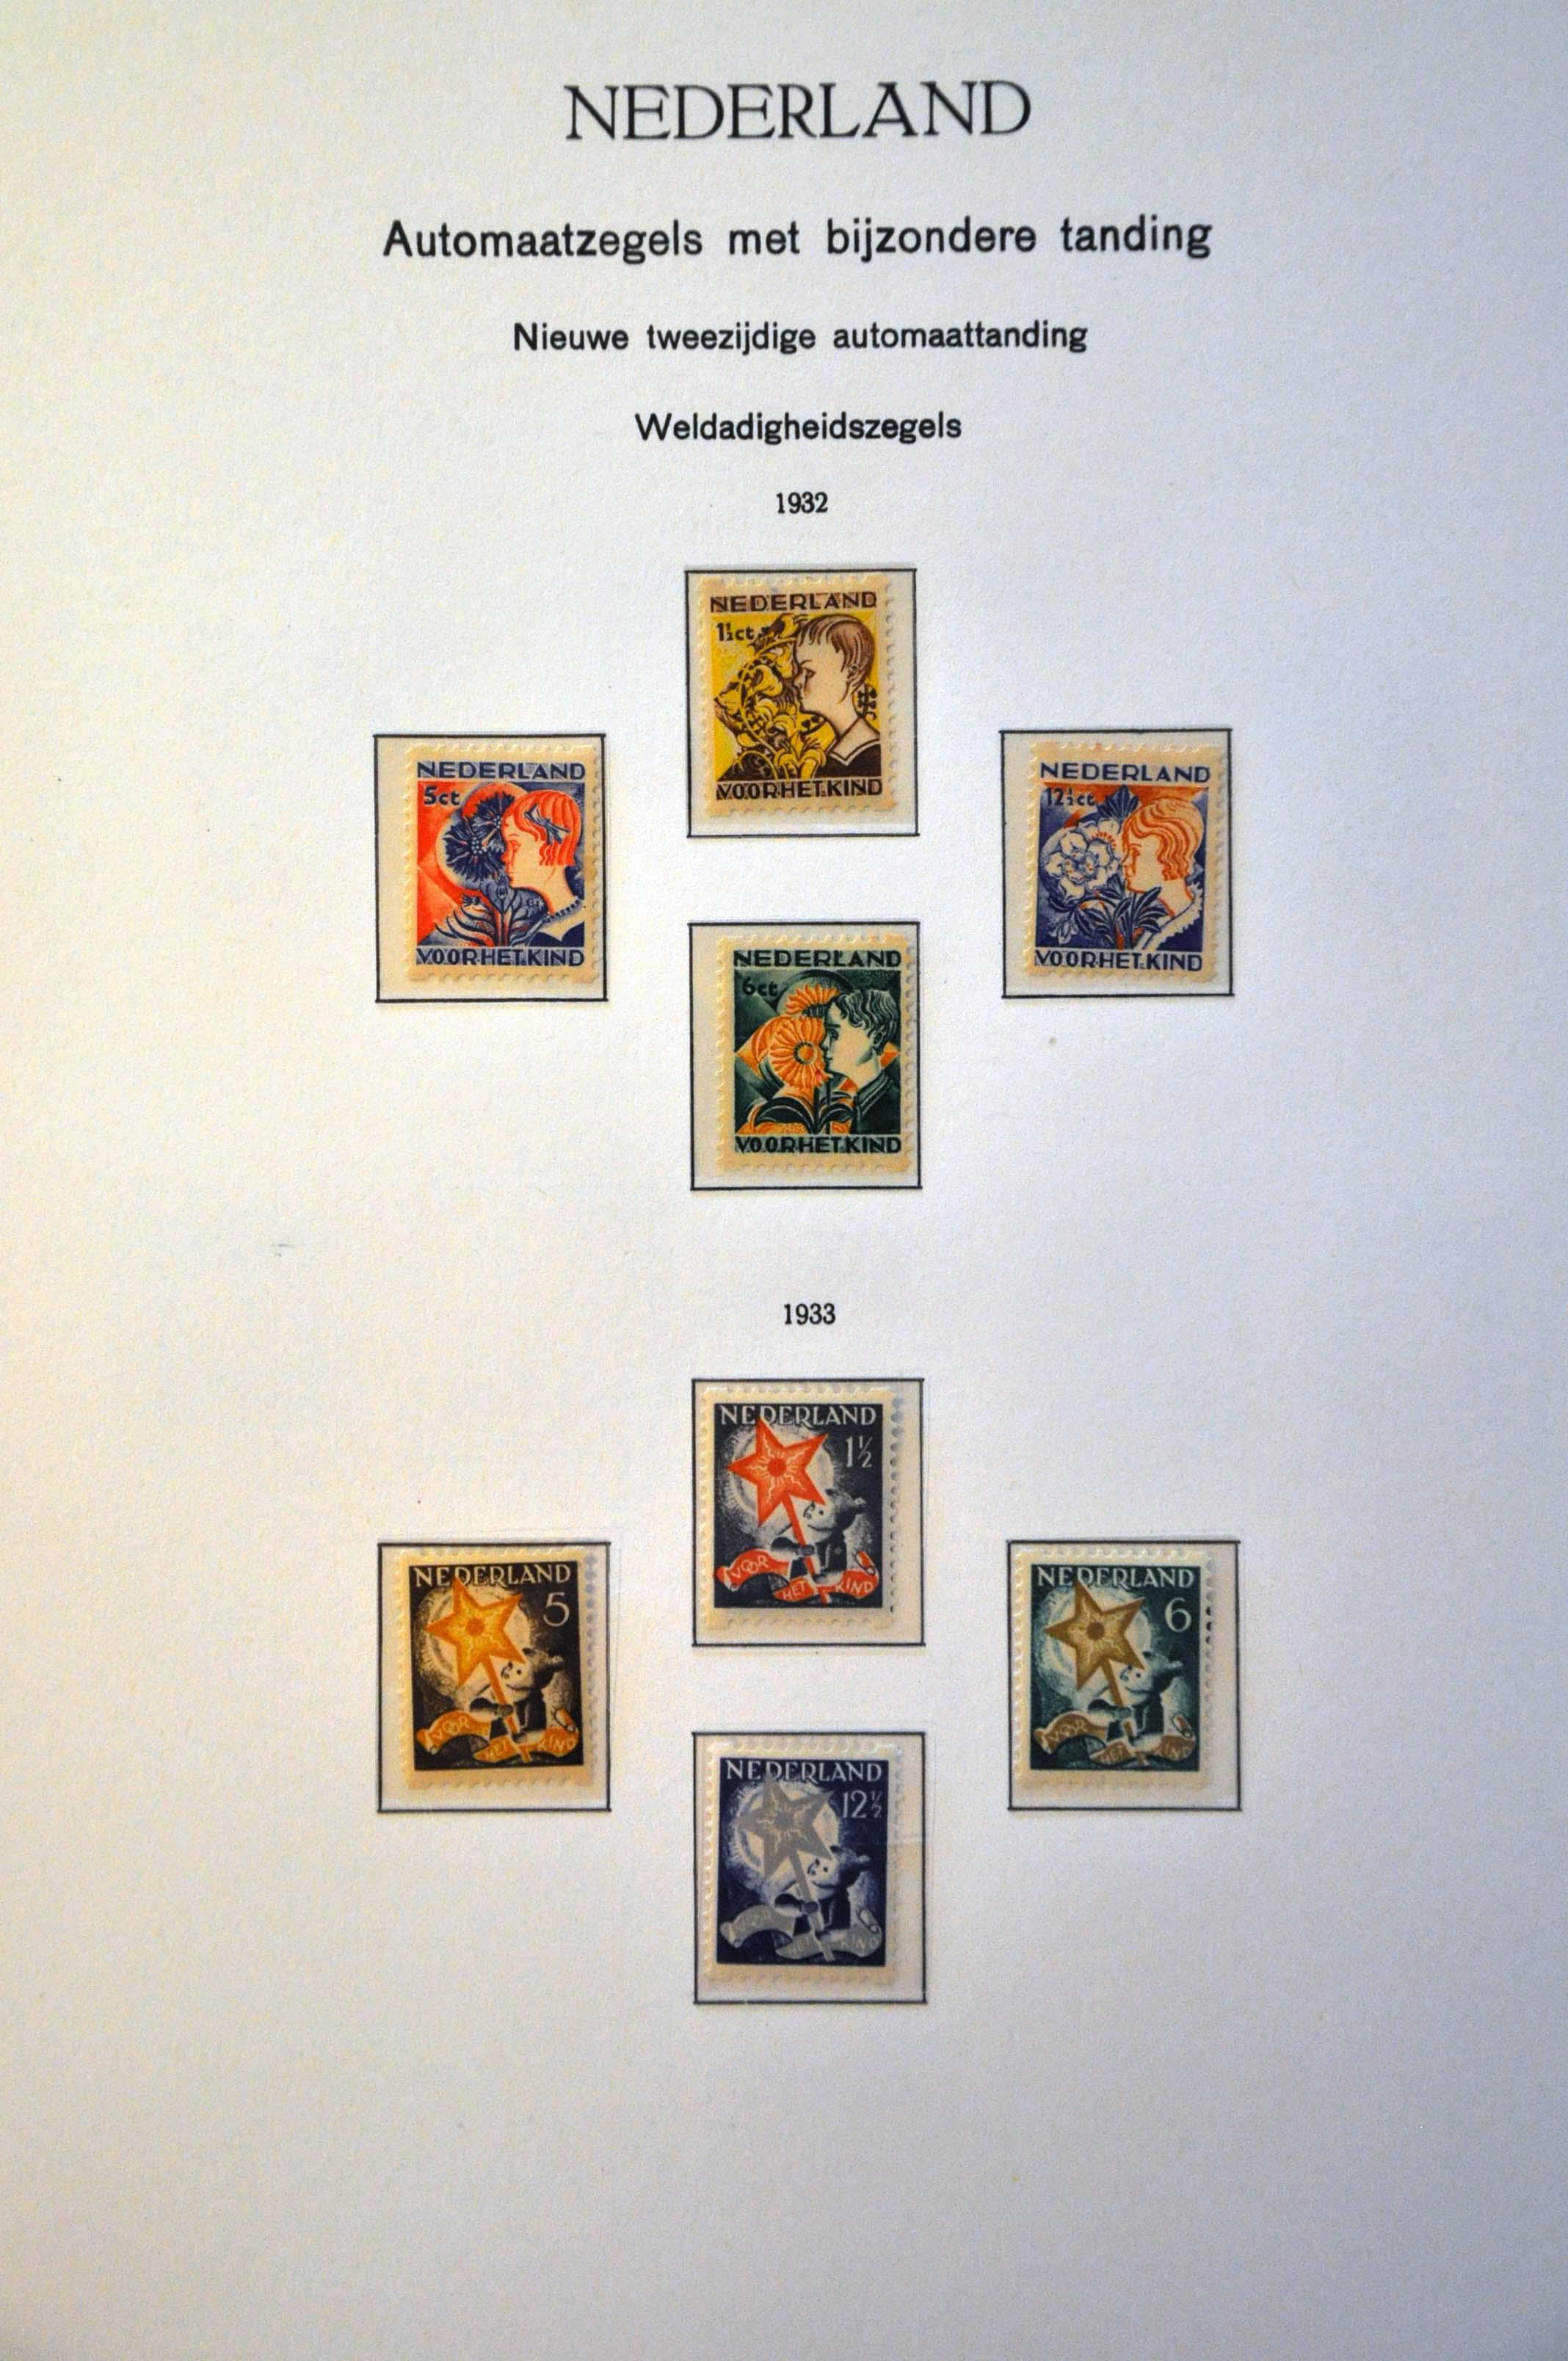 Lot 1459 - Netherlands and former colonies Netherlands -  Corinphila Veilingen Auction 239: General sale